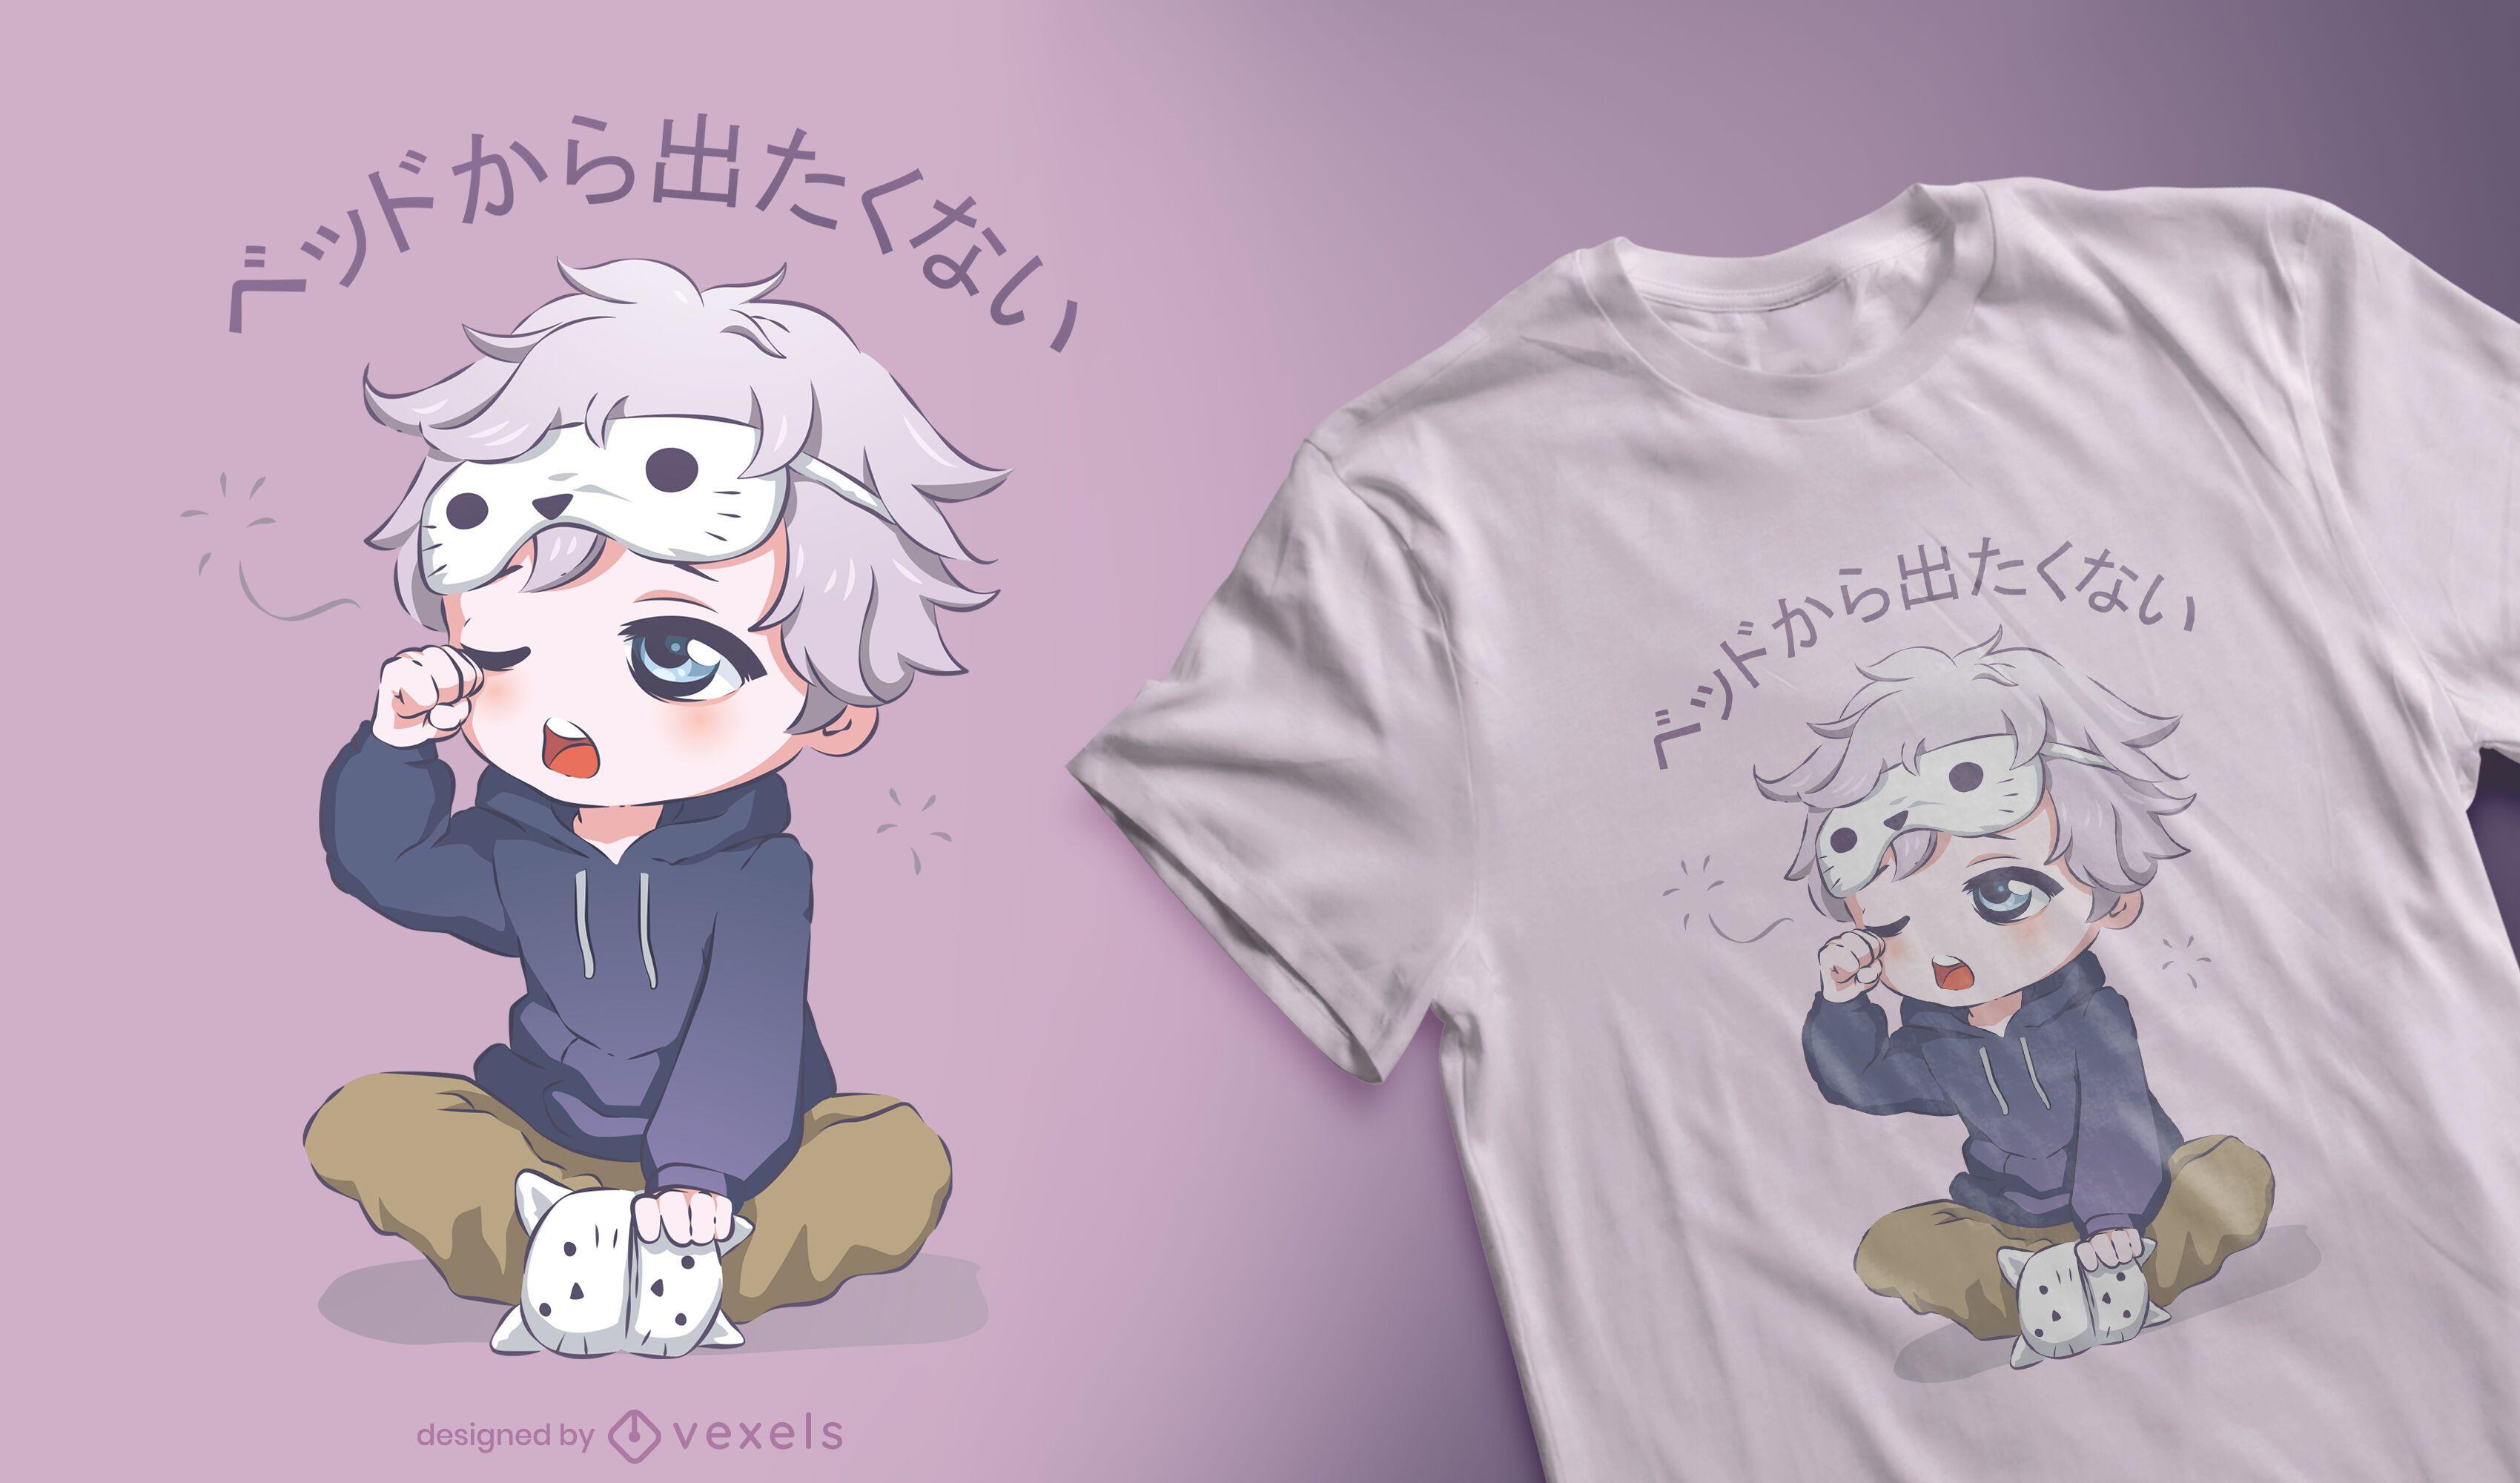 Sleepy anime boy t-shirt design